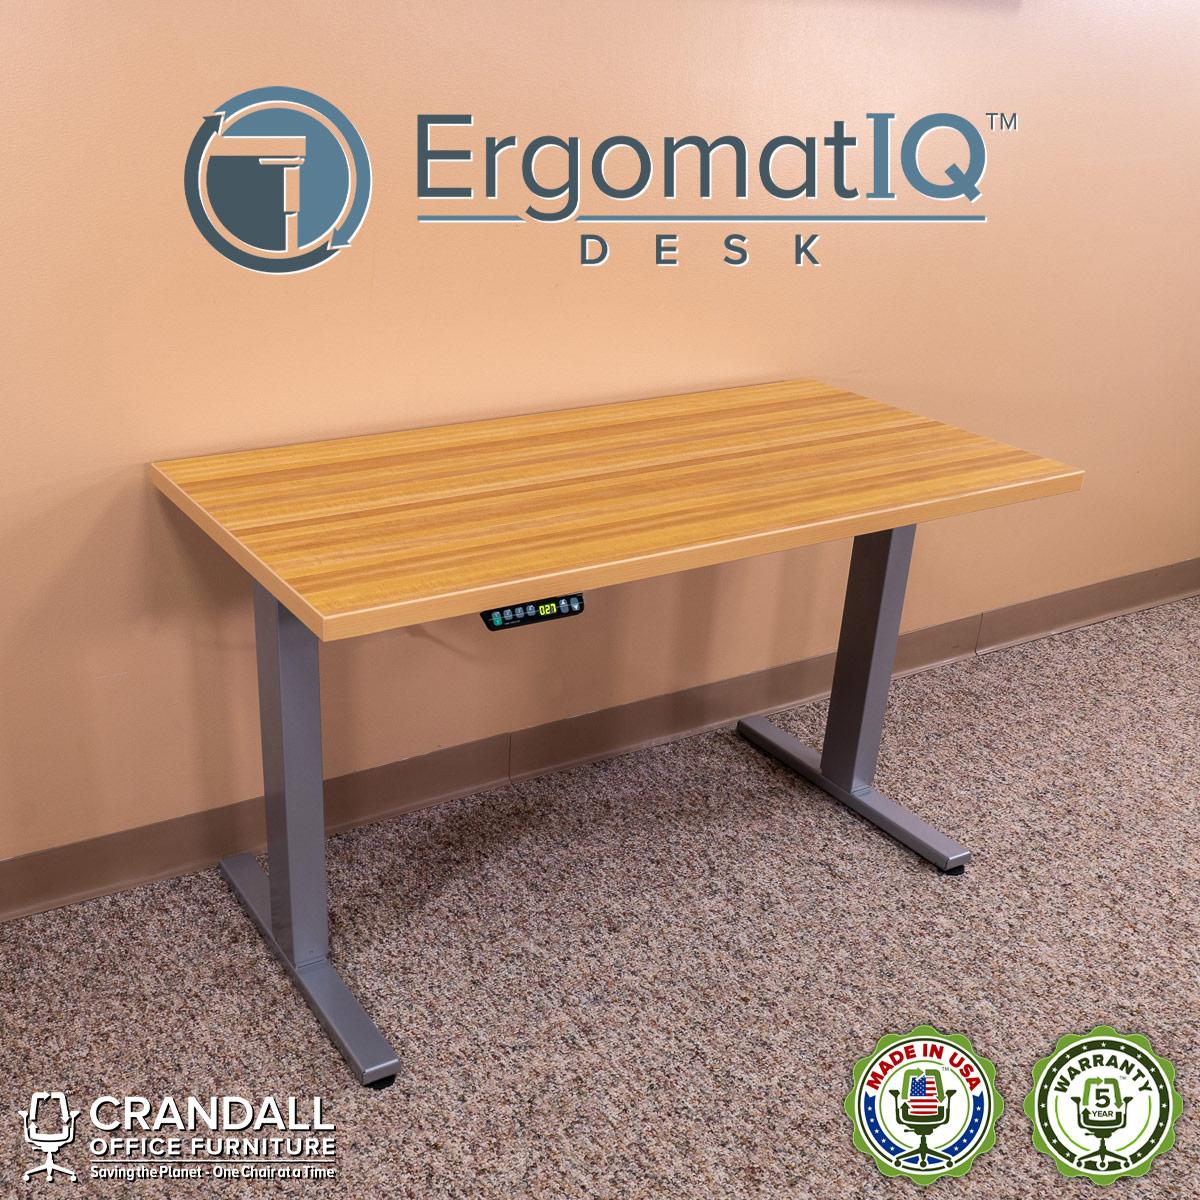 Crandall-Office-Furniture-ErgomatIQ Height-Adjustable-Desk-001